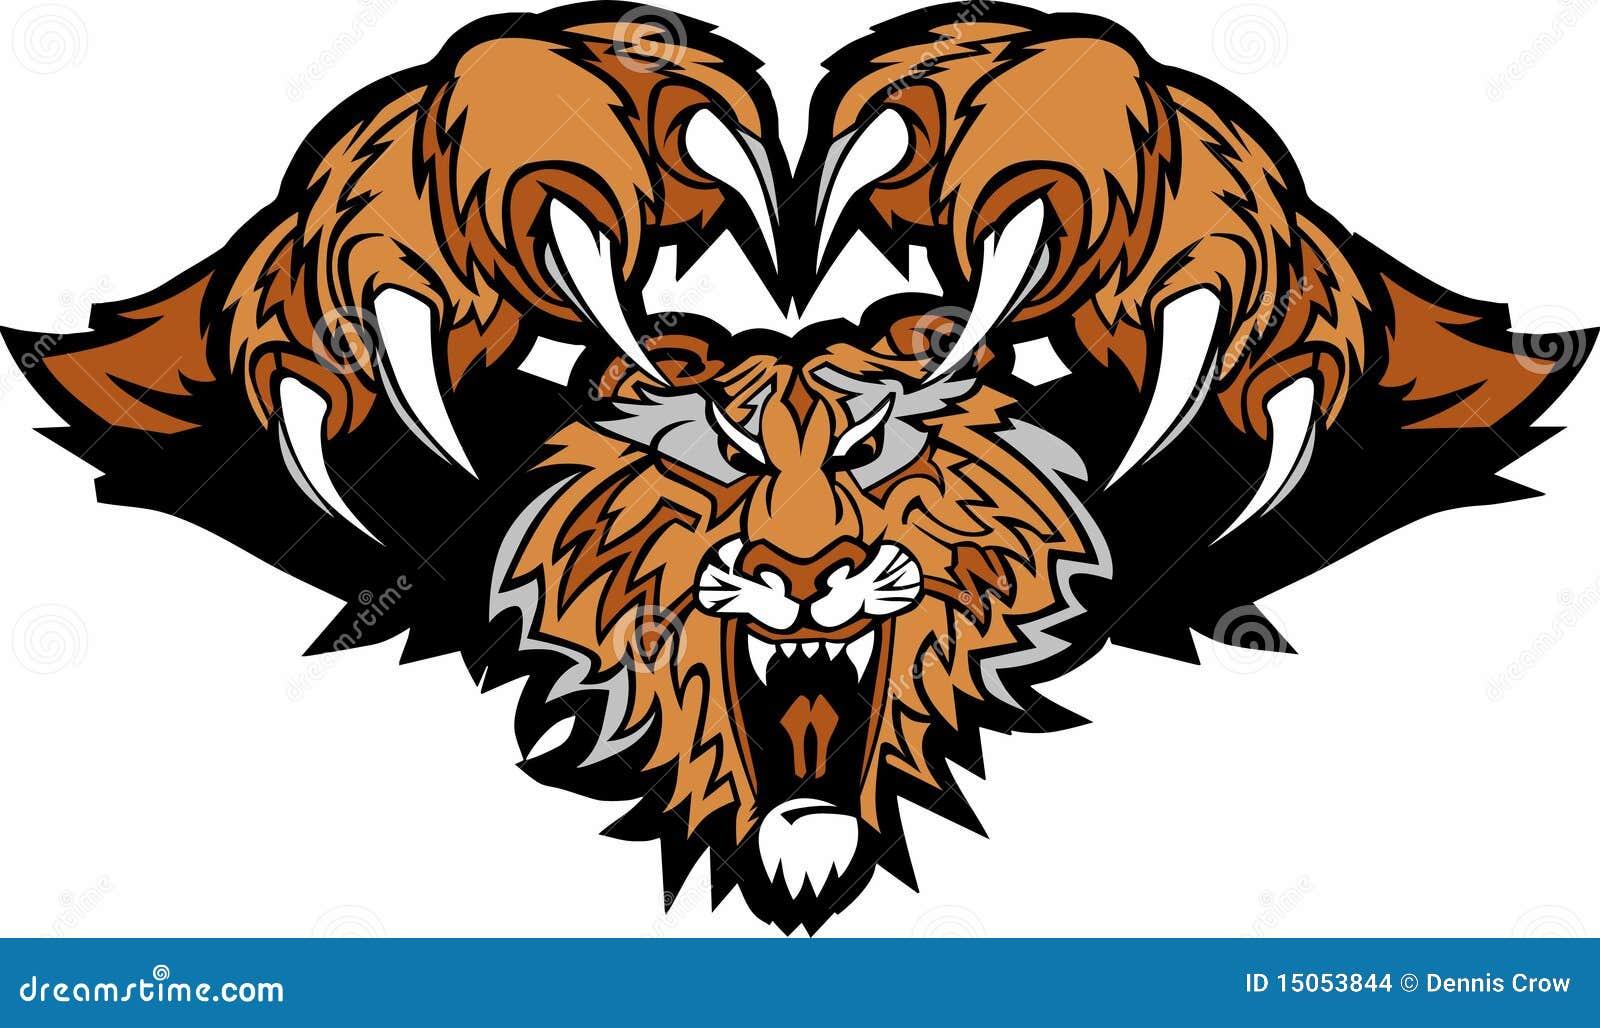 Très Logo De Attaque Subit De Mascotte De Tigre Illustration de Vecteur  MX63